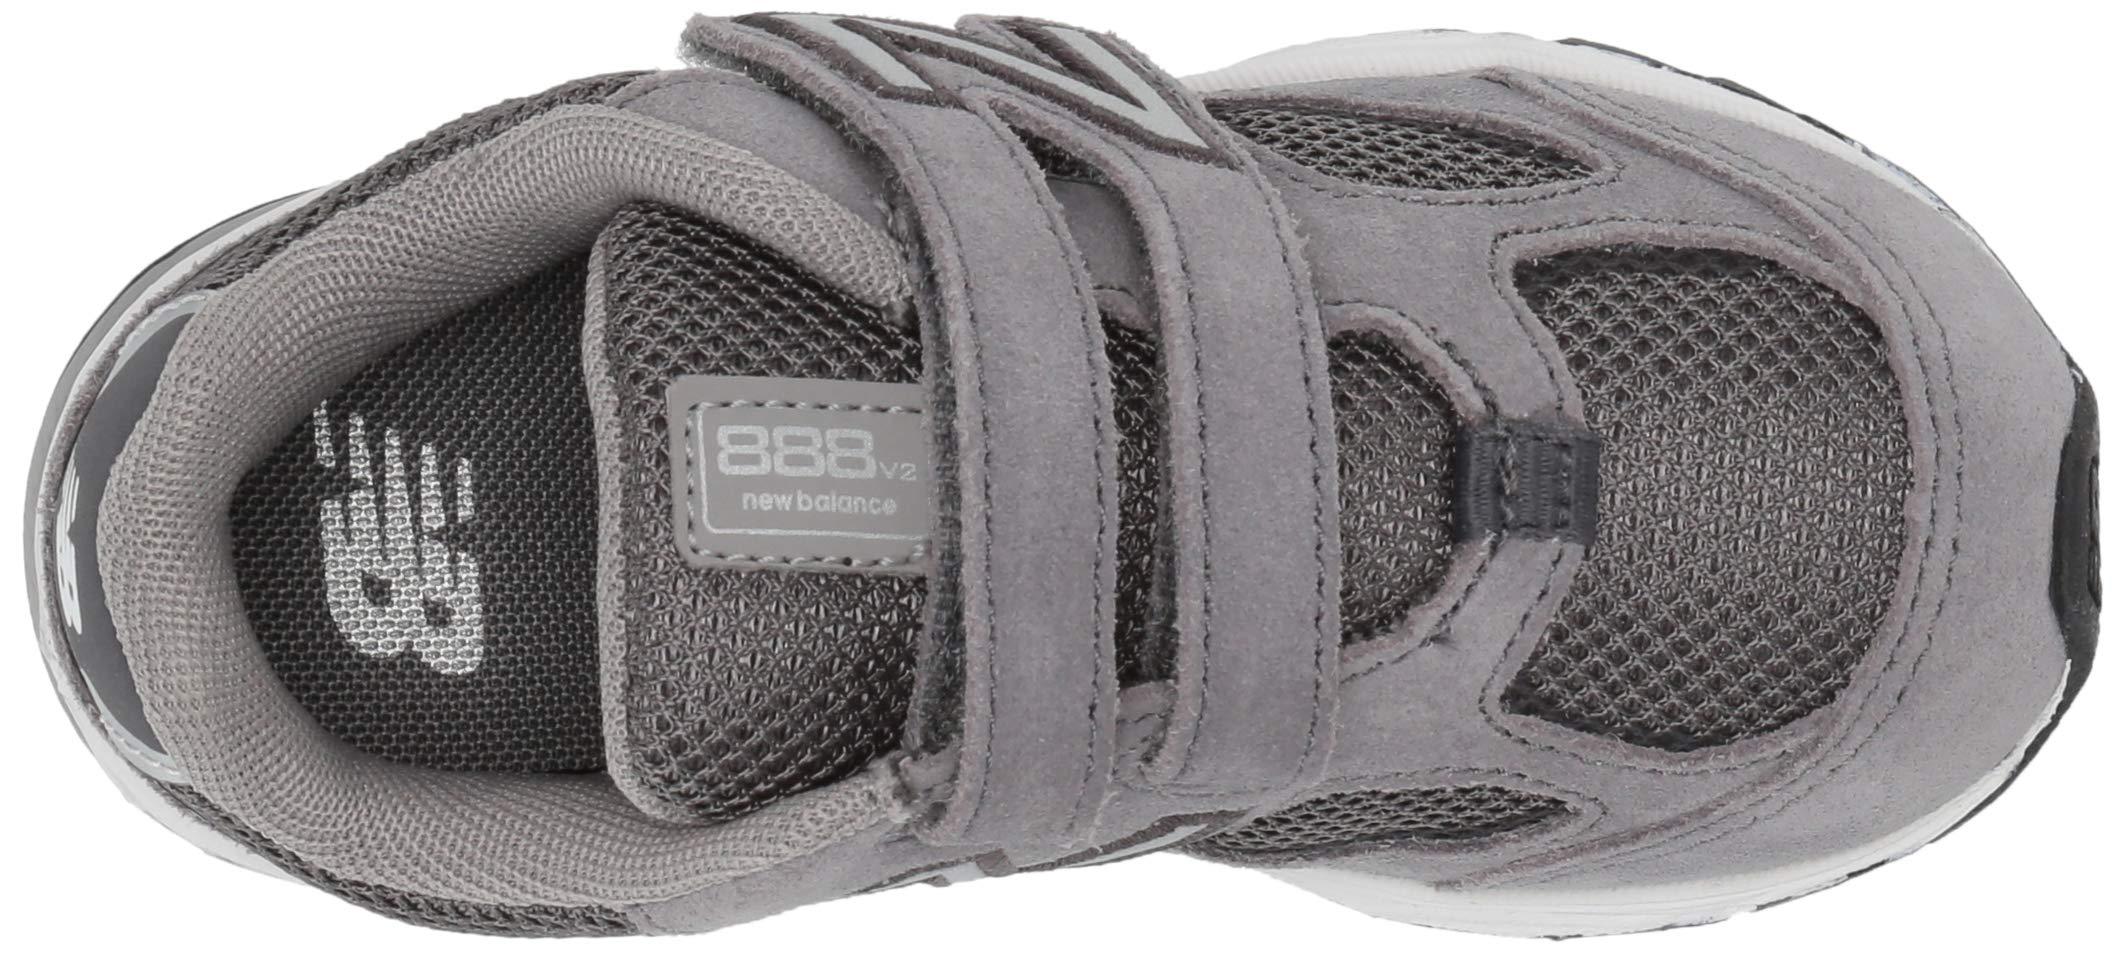 New Balance Boys' 888v2 Hook and Loop Running Shoe, Dark Grey, 2 M US Infant by New Balance (Image #7)